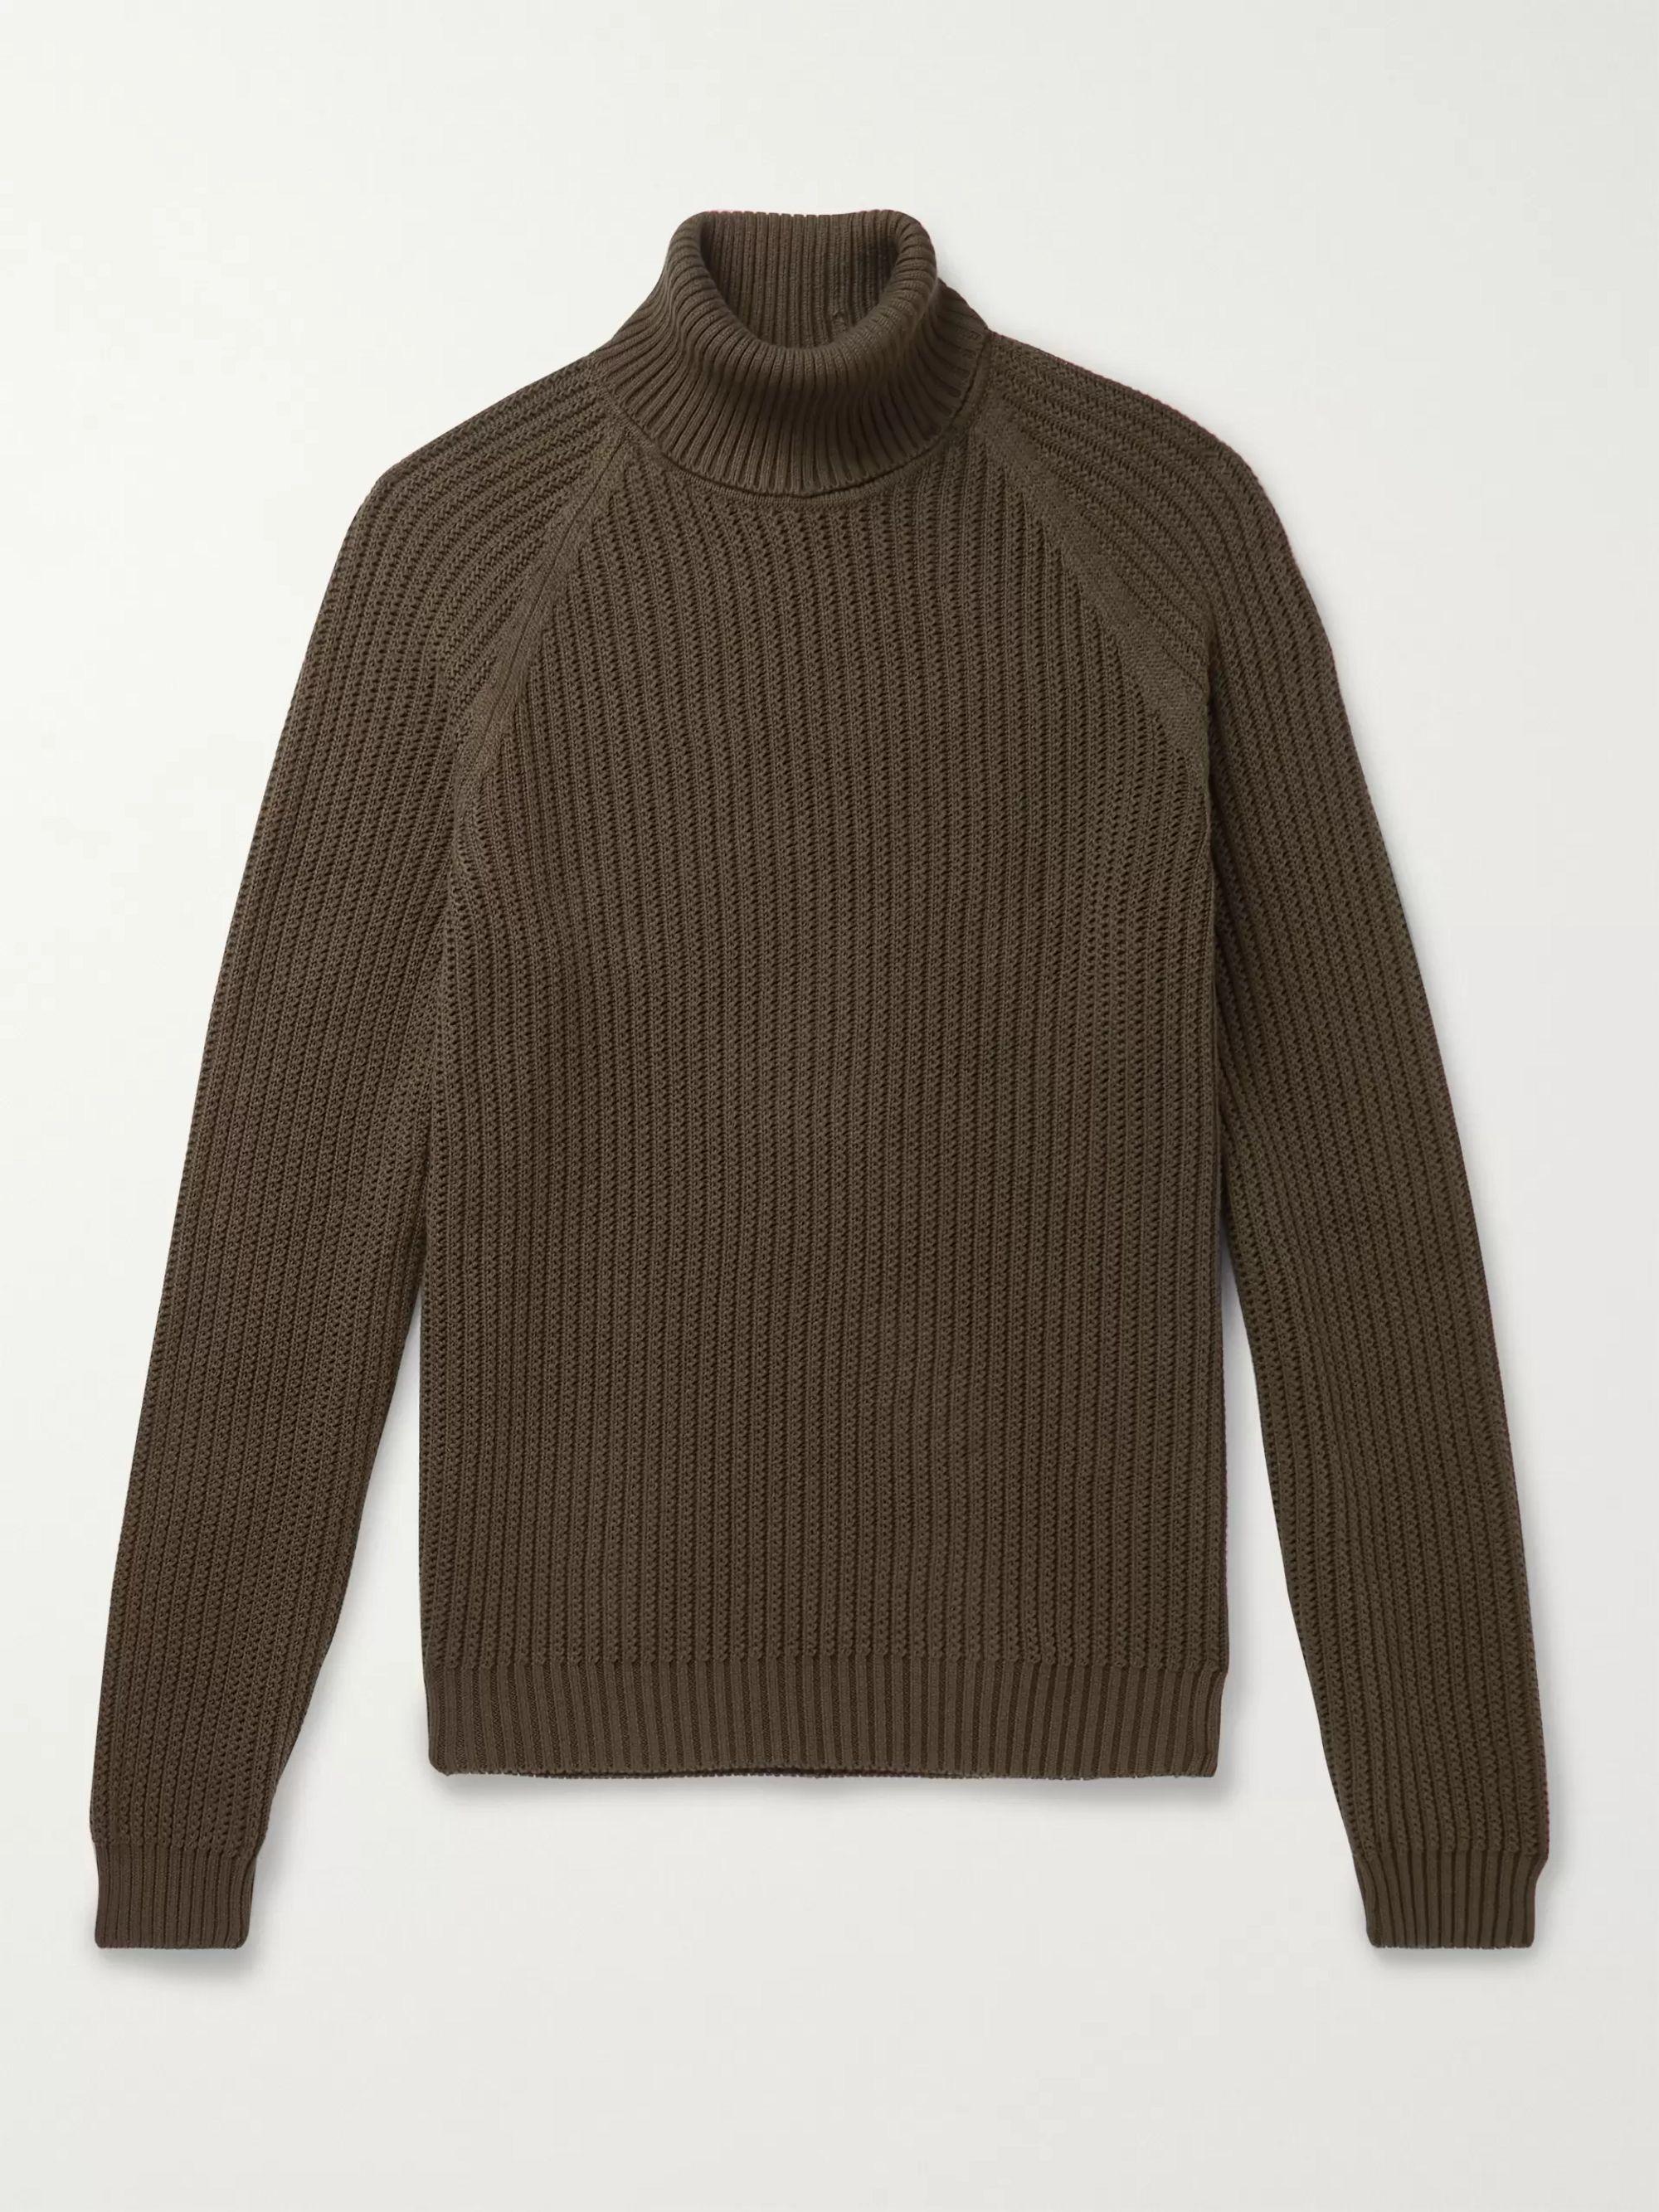 HUGO BOSS Ribbed Cotton Rollneck Sweater